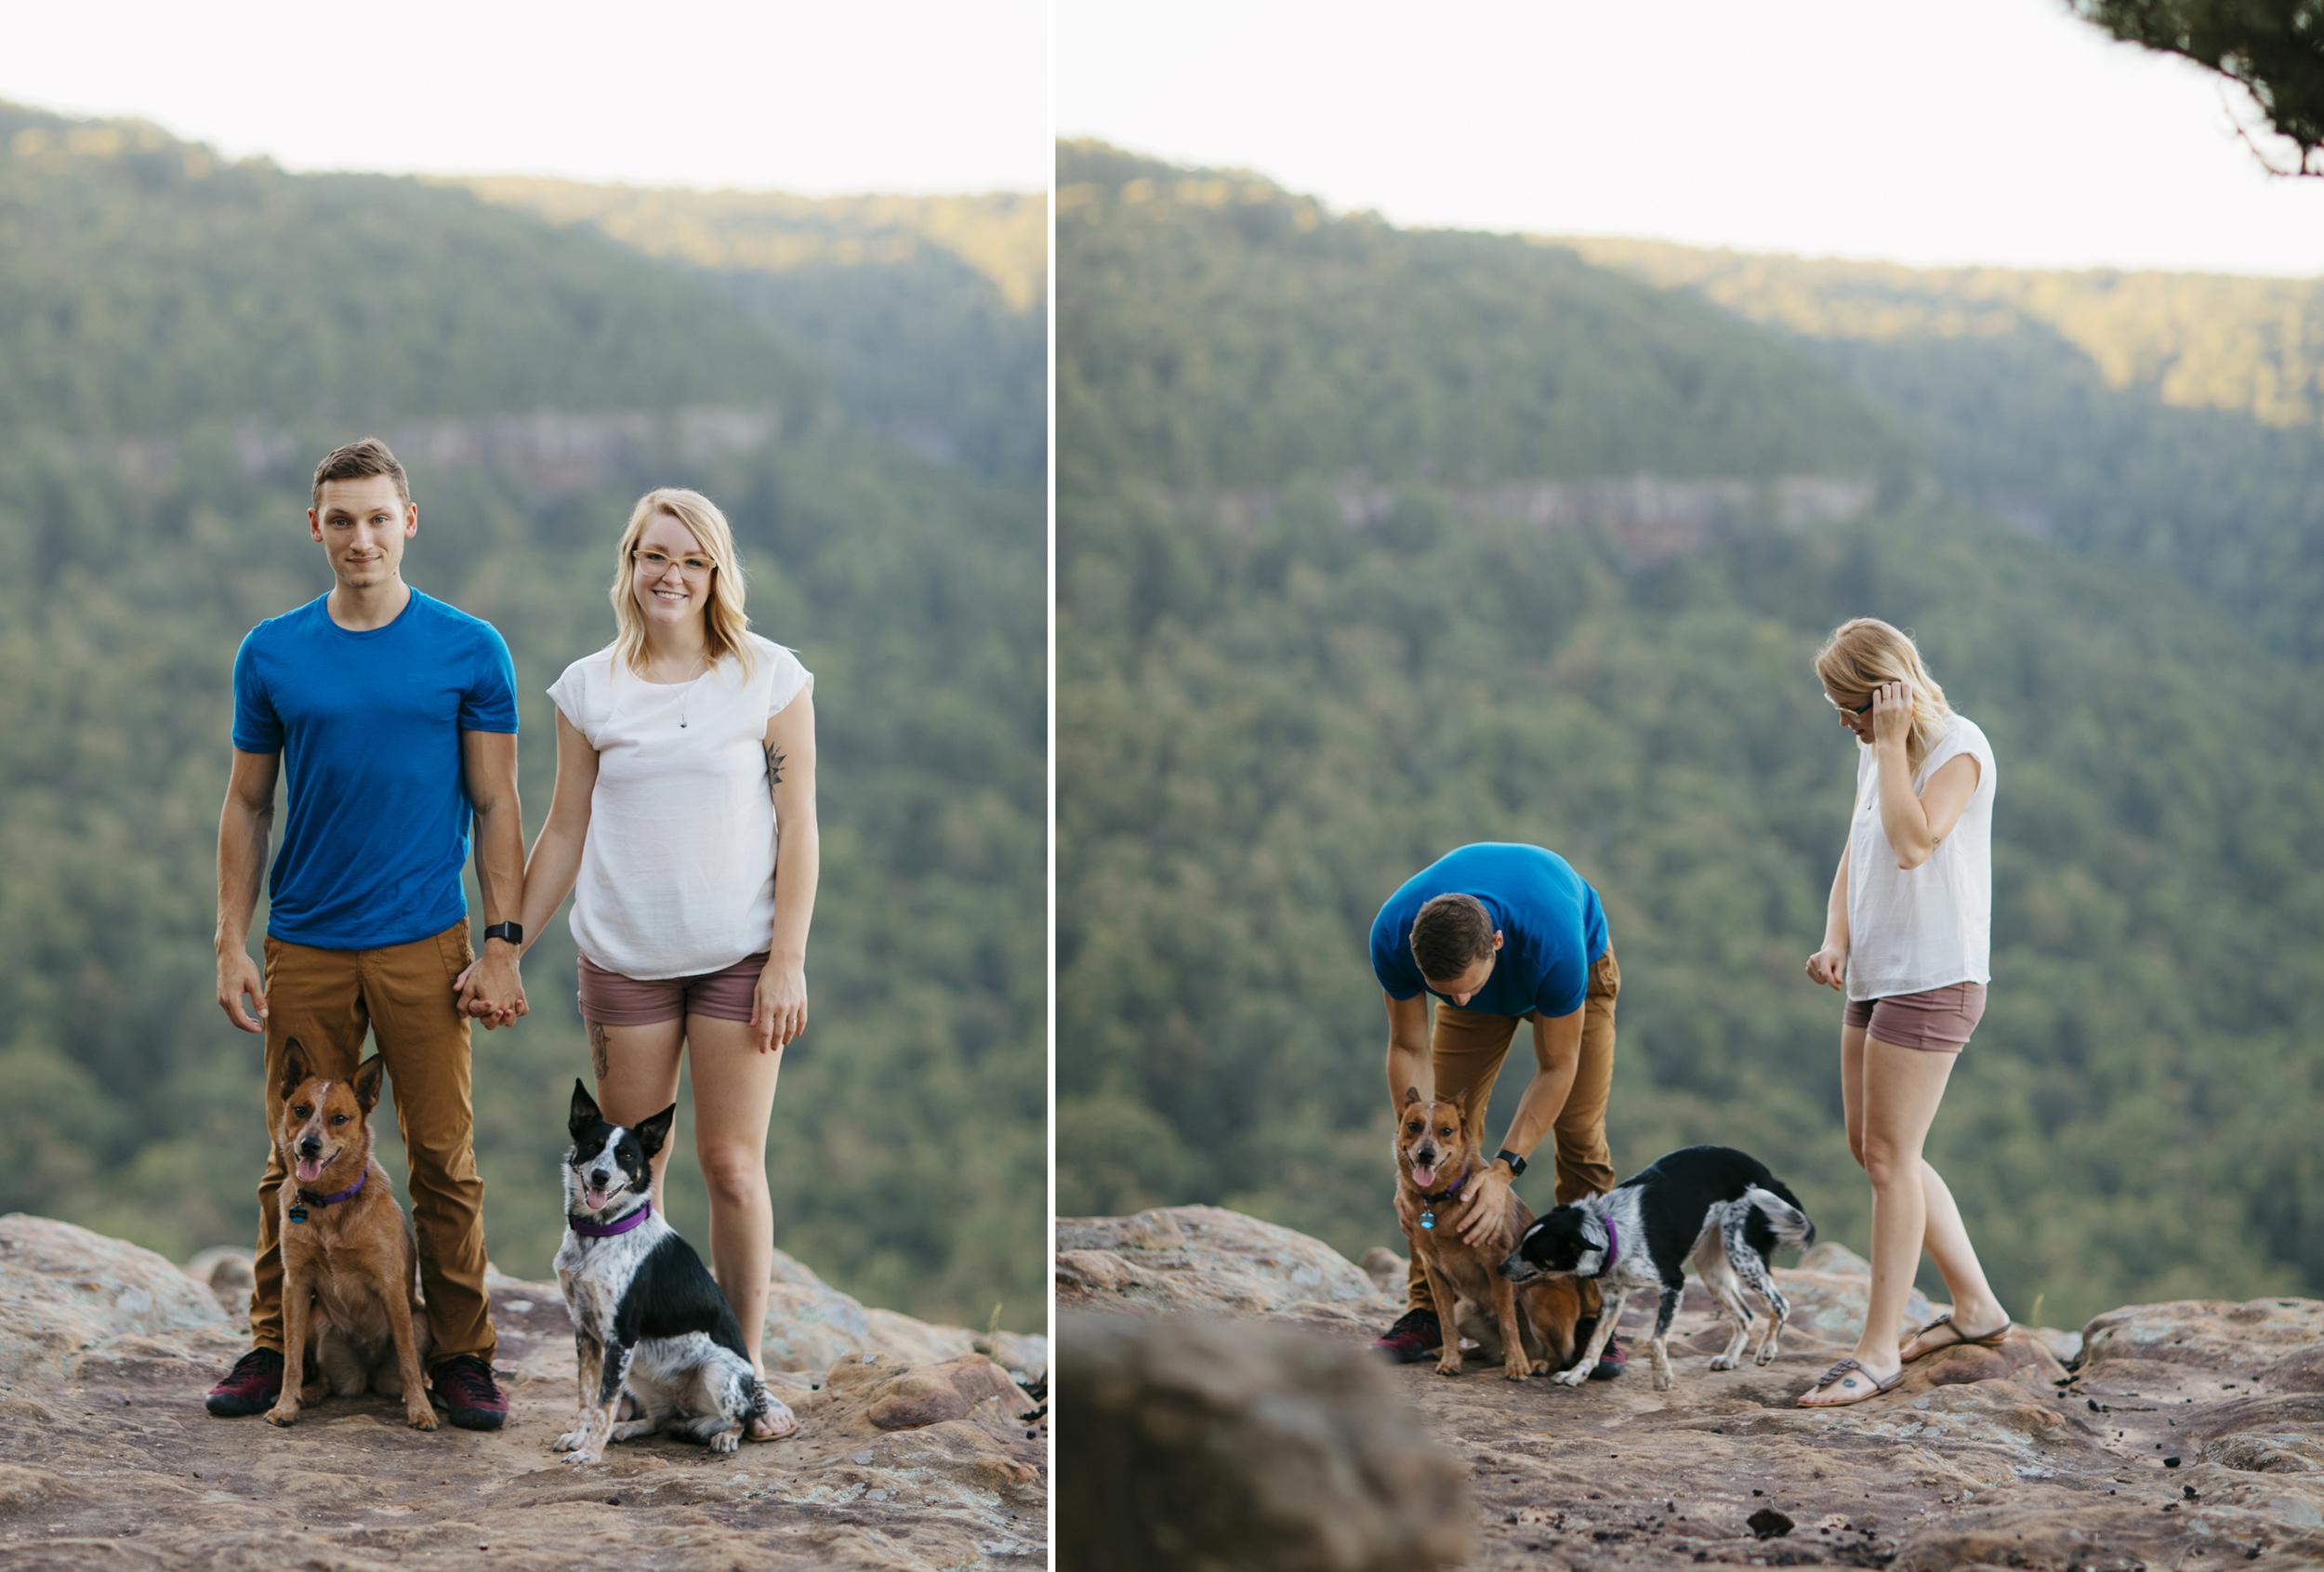 Buffalo-River-Arkansas-Sams-Throne-Adventure-Engagement-Photographer33.JPG